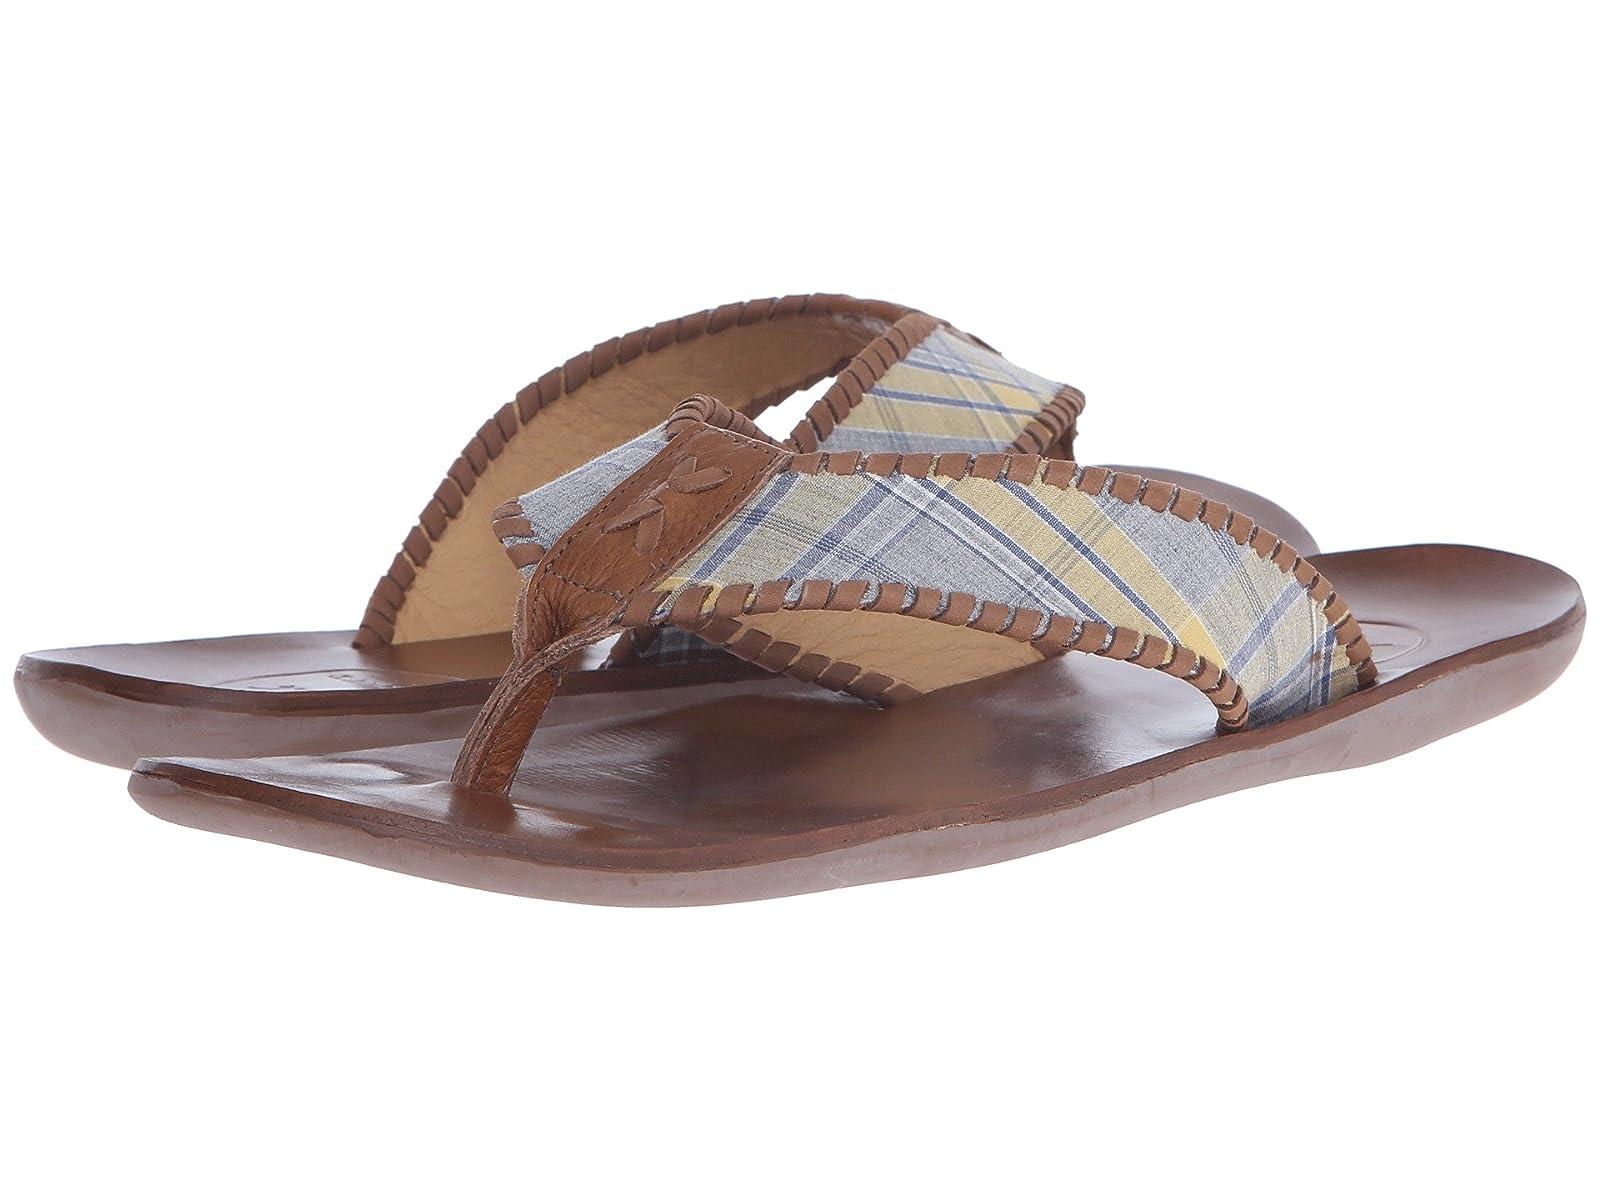 Jack Rogers Sullivan PlaidCheap and distinctive eye-catching shoes